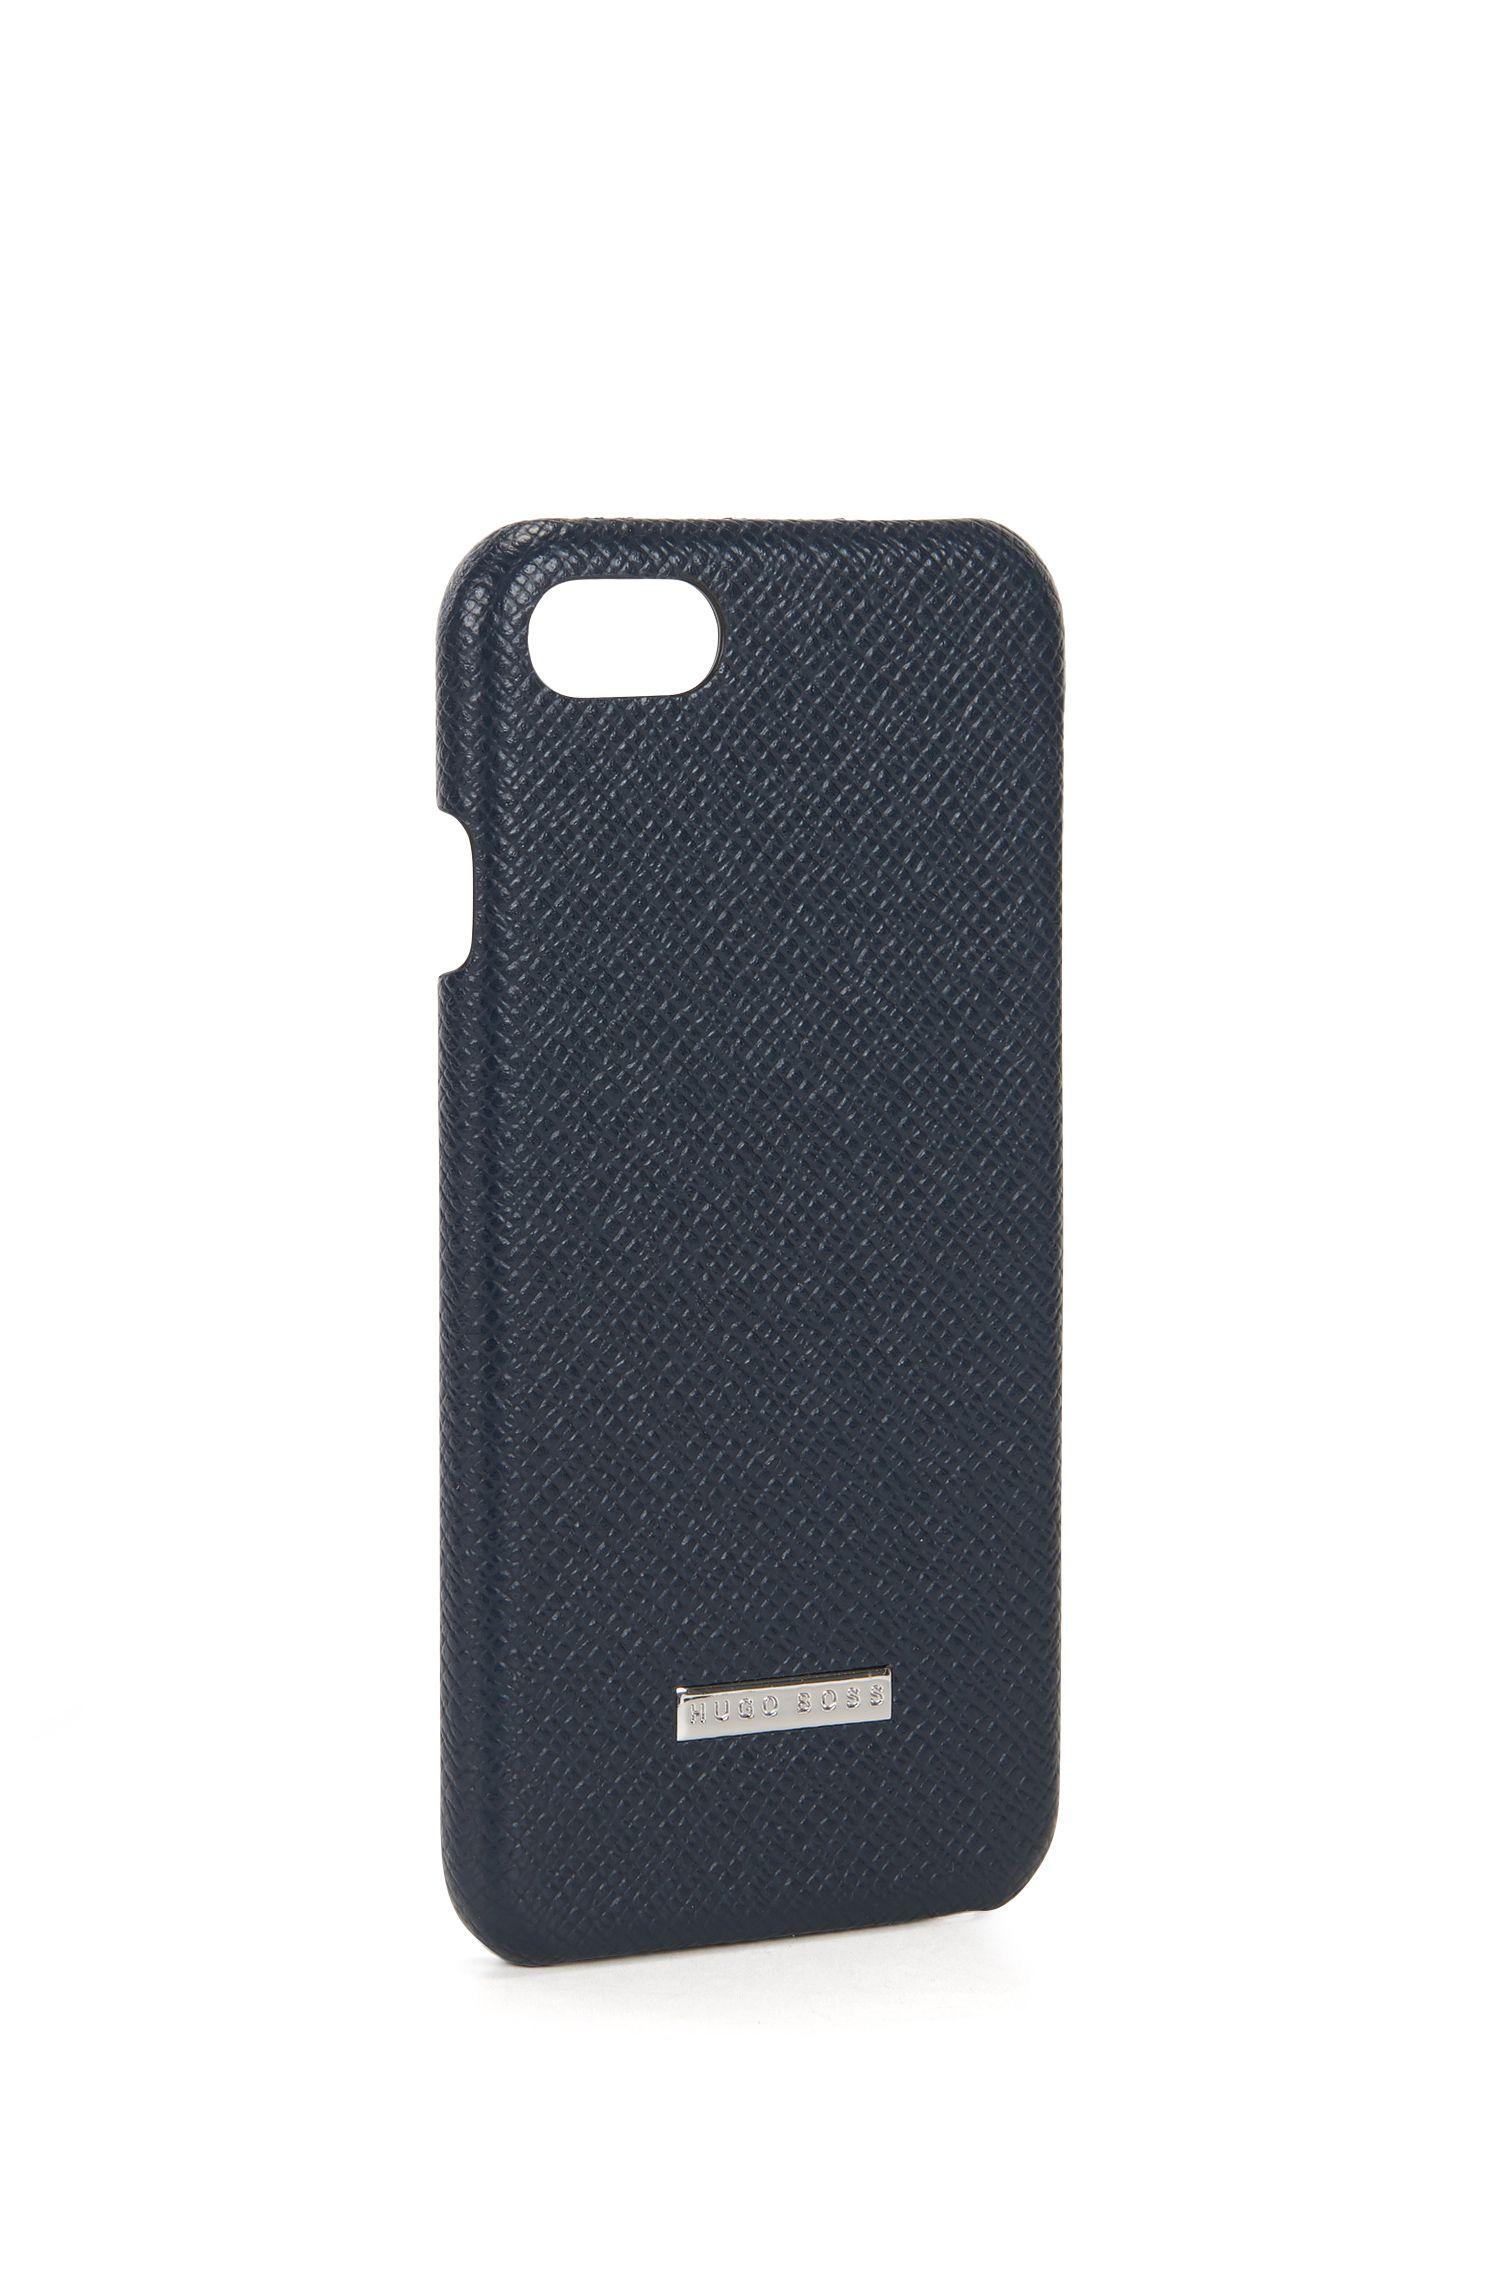 Embossed leather iPhone 7 Case | Signature Phone 7